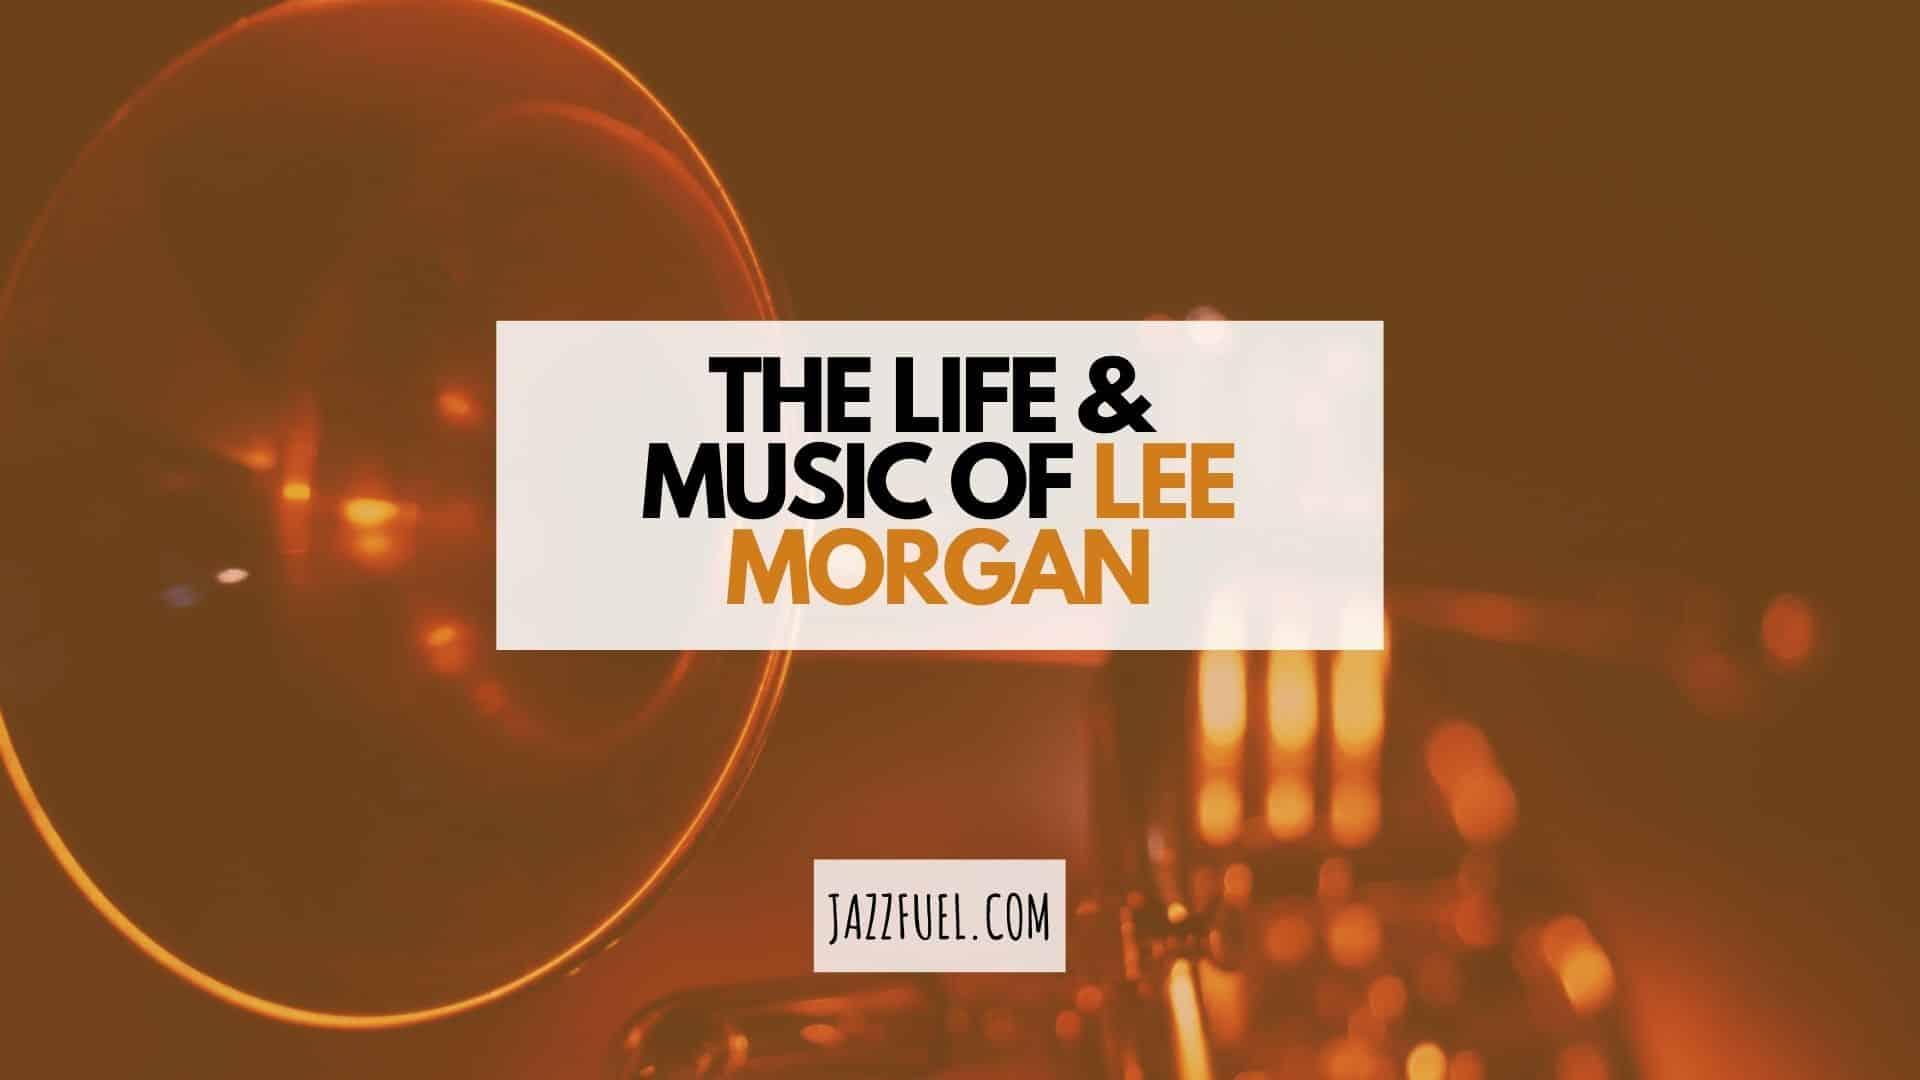 Lee Morgan – Life & Music of a Blue Note Trumpet Legend